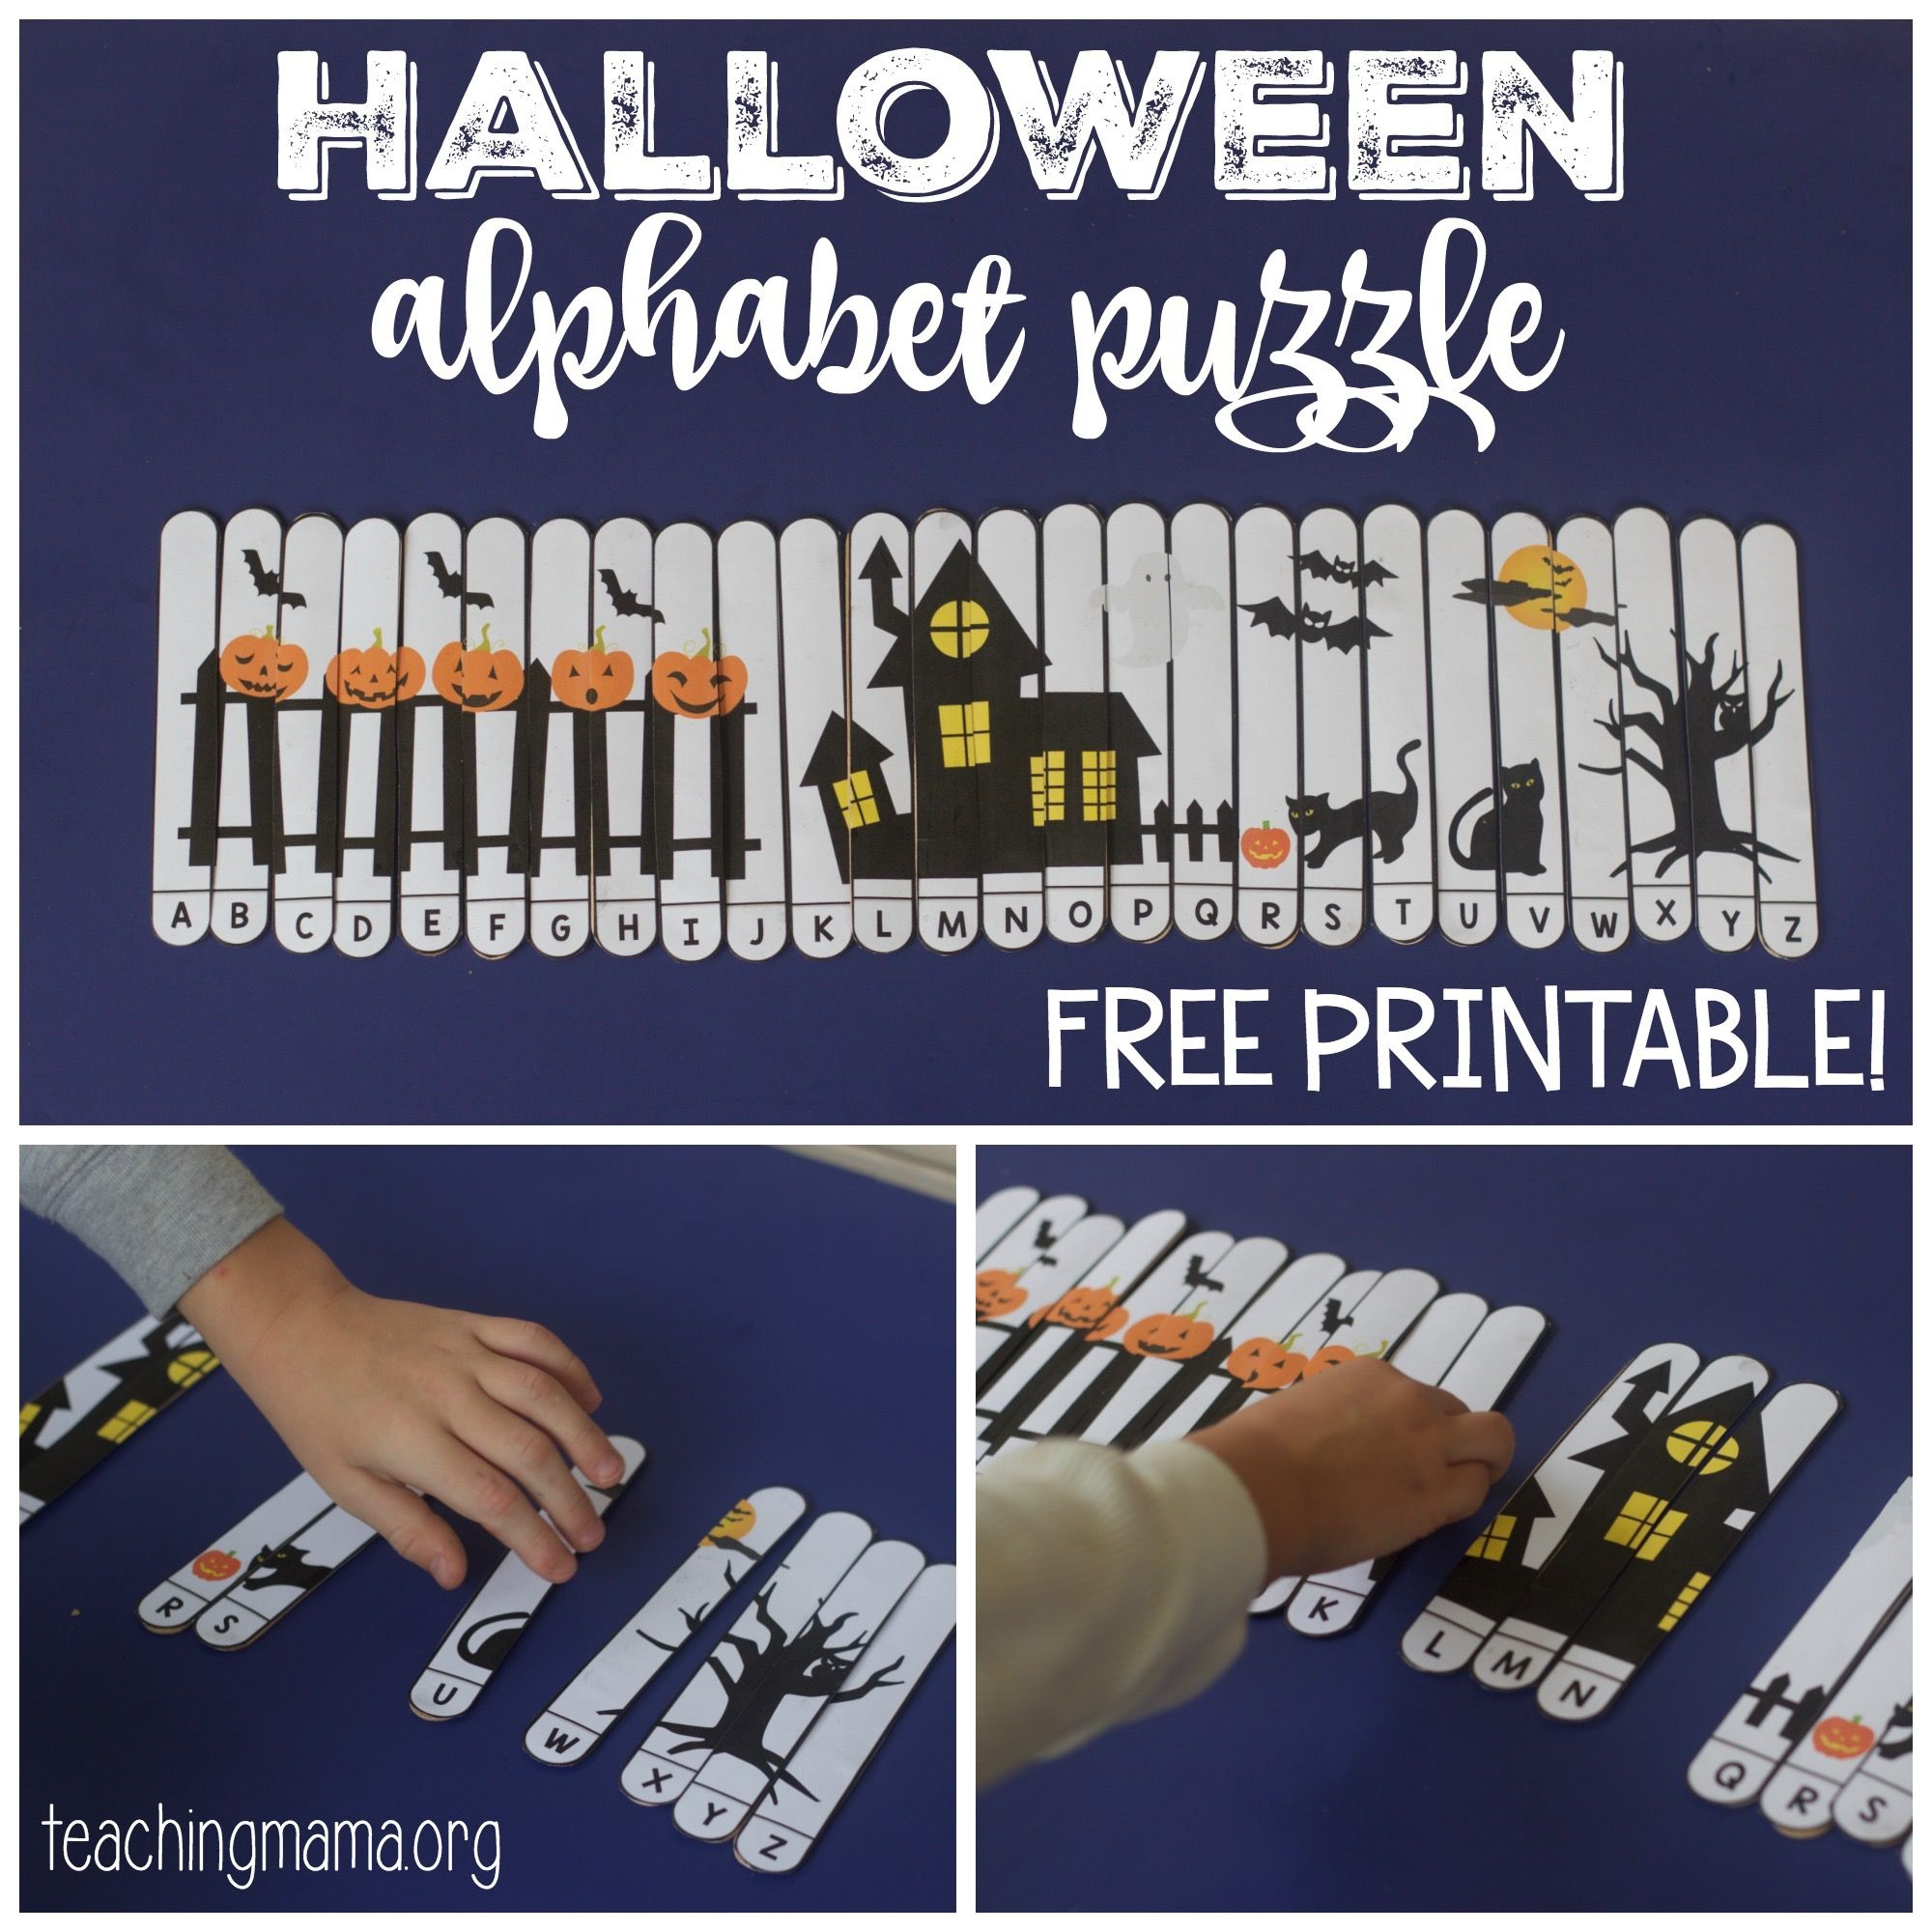 Halloween Alphabet Puzzle School